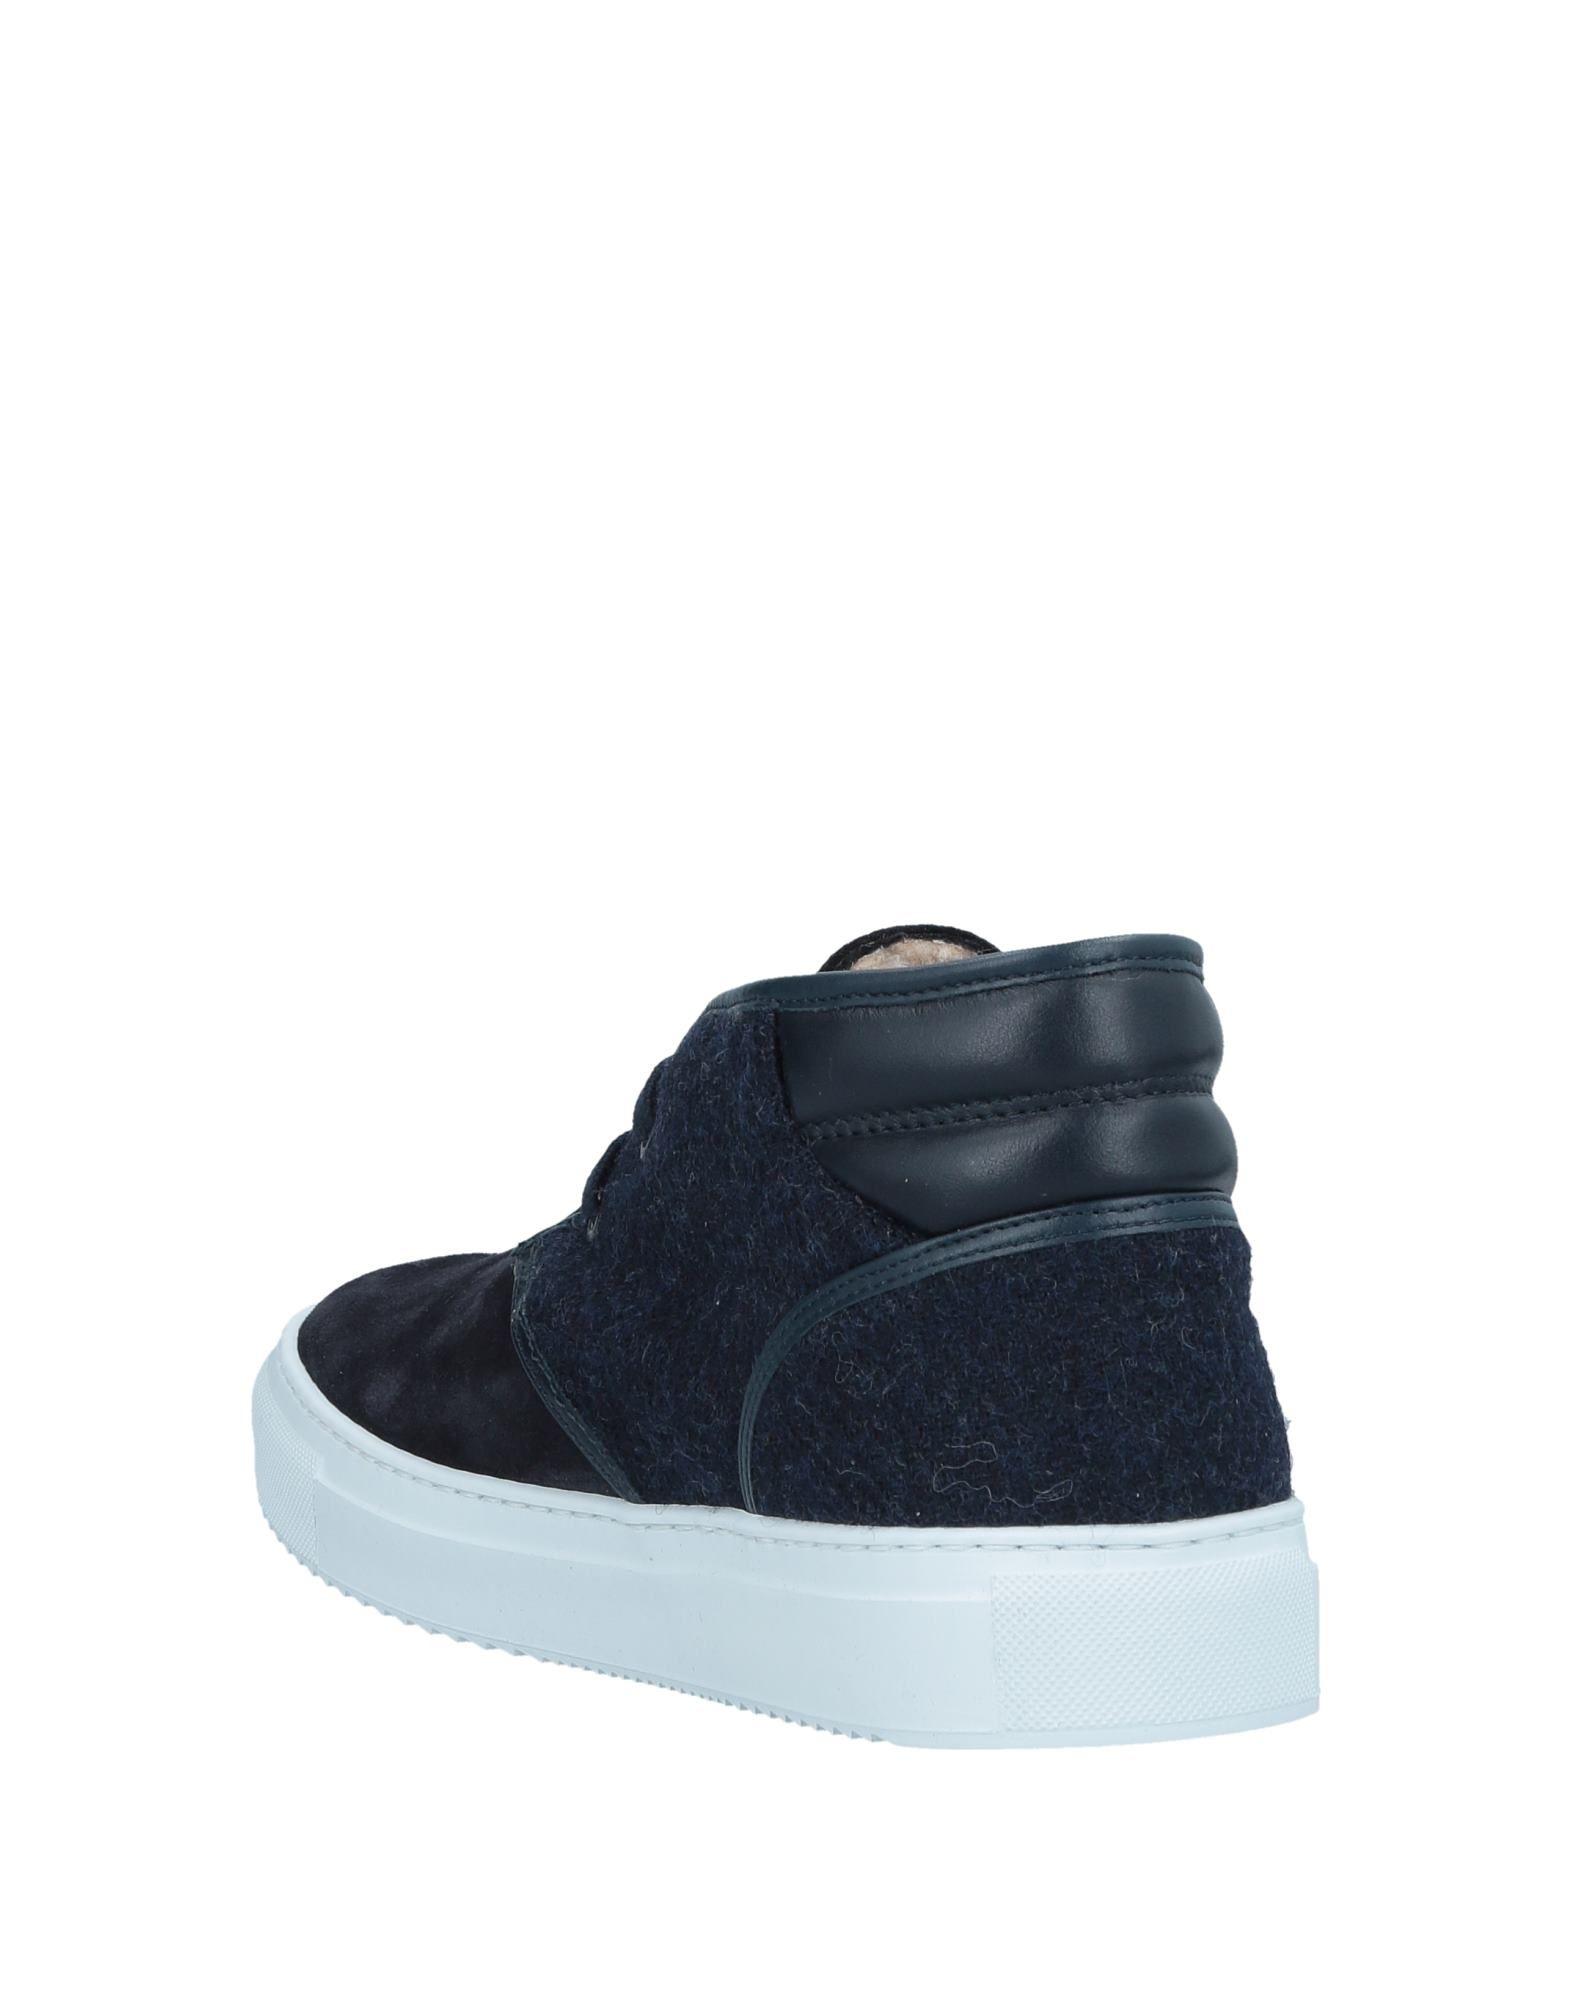 Fabi Sneakers - Men Men Men Fabi Sneakers online on  Australia - 11532453WN 0f98e7